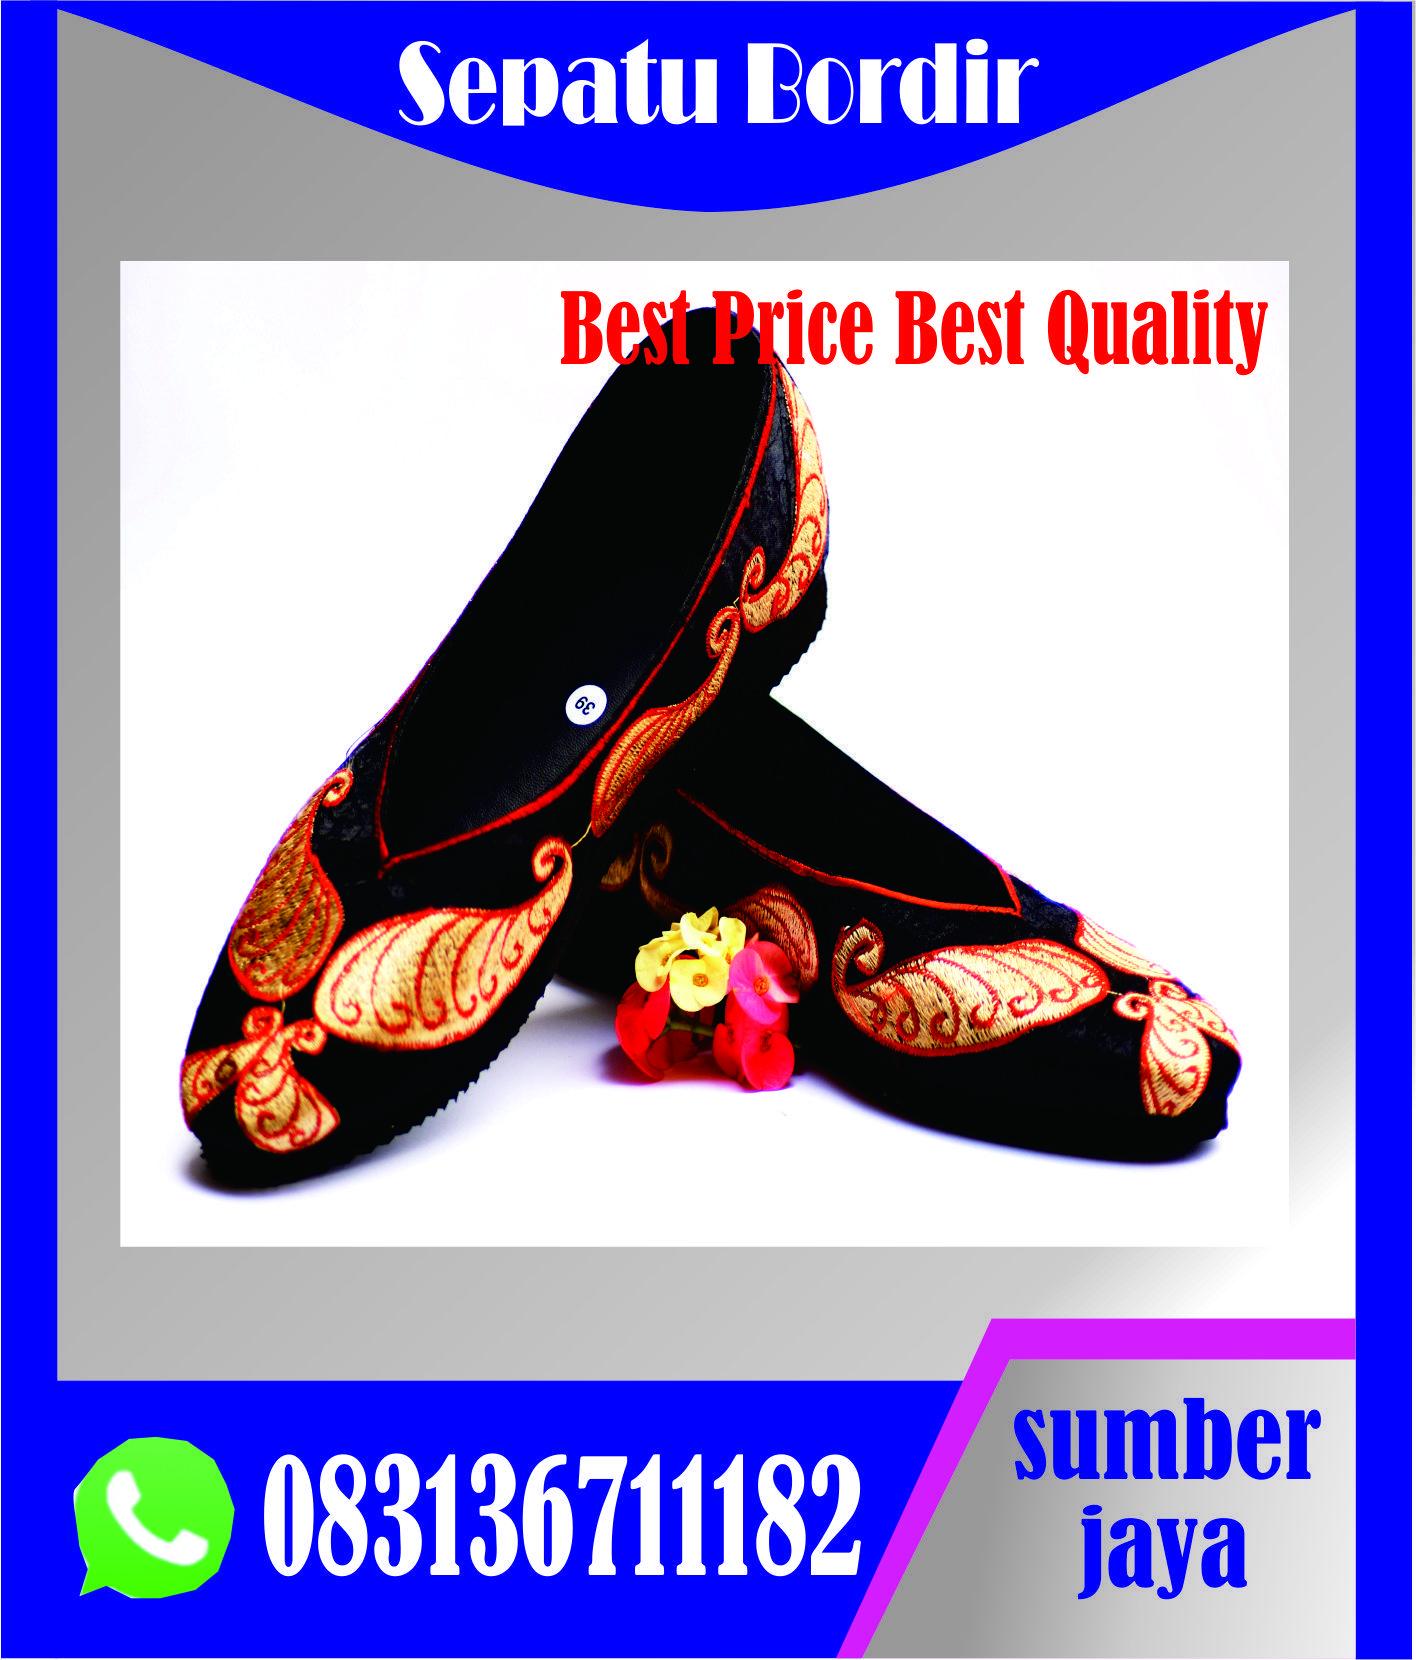 Sepatu Bordir Malang Sepatu Bordir Surabaya Sepatu Bordir Jogja Sepatu Bordir Motif Sepatu Bordir Wanita Tua Kasut Bordir Wanita Kasut Bordir Wanit Sepatu